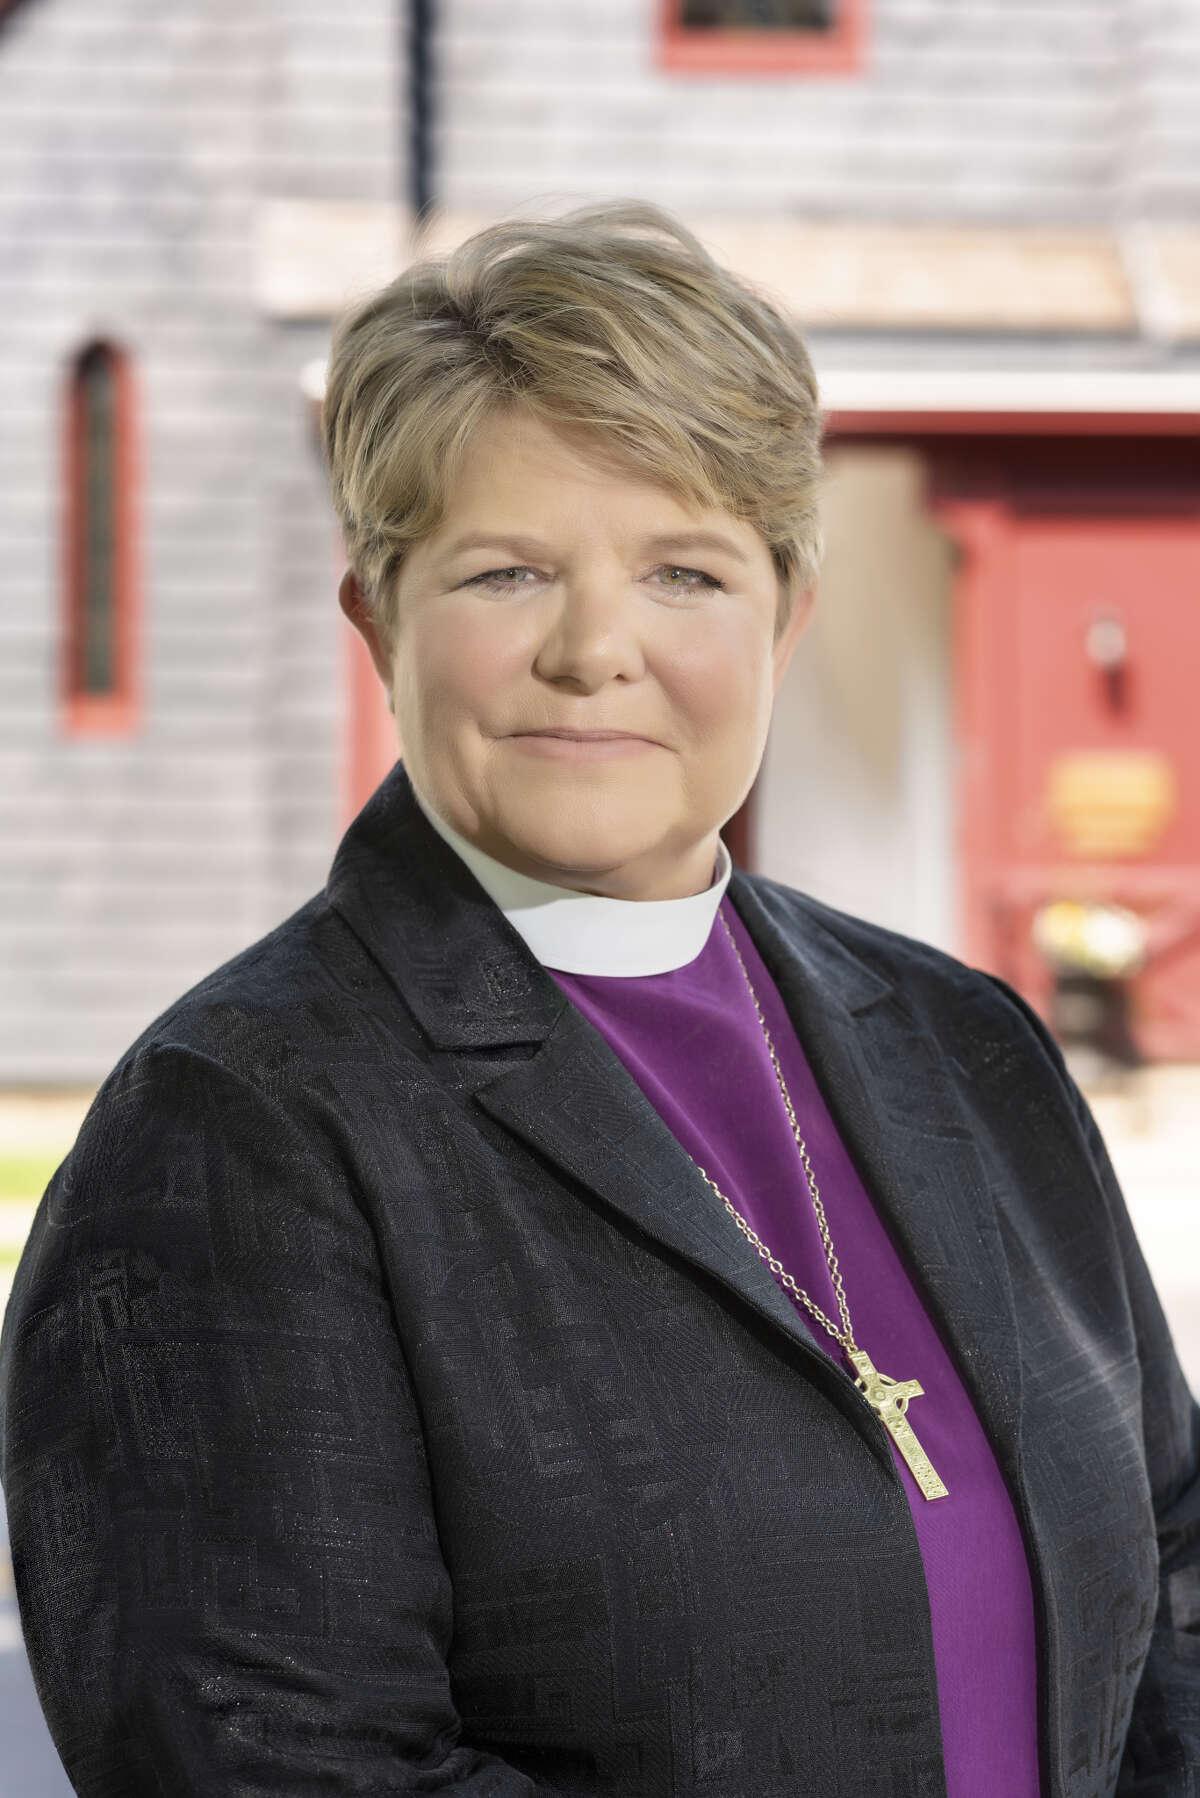 Bishop DeDe Duncan-Probe of the Episcopal Diocese of Central New York.